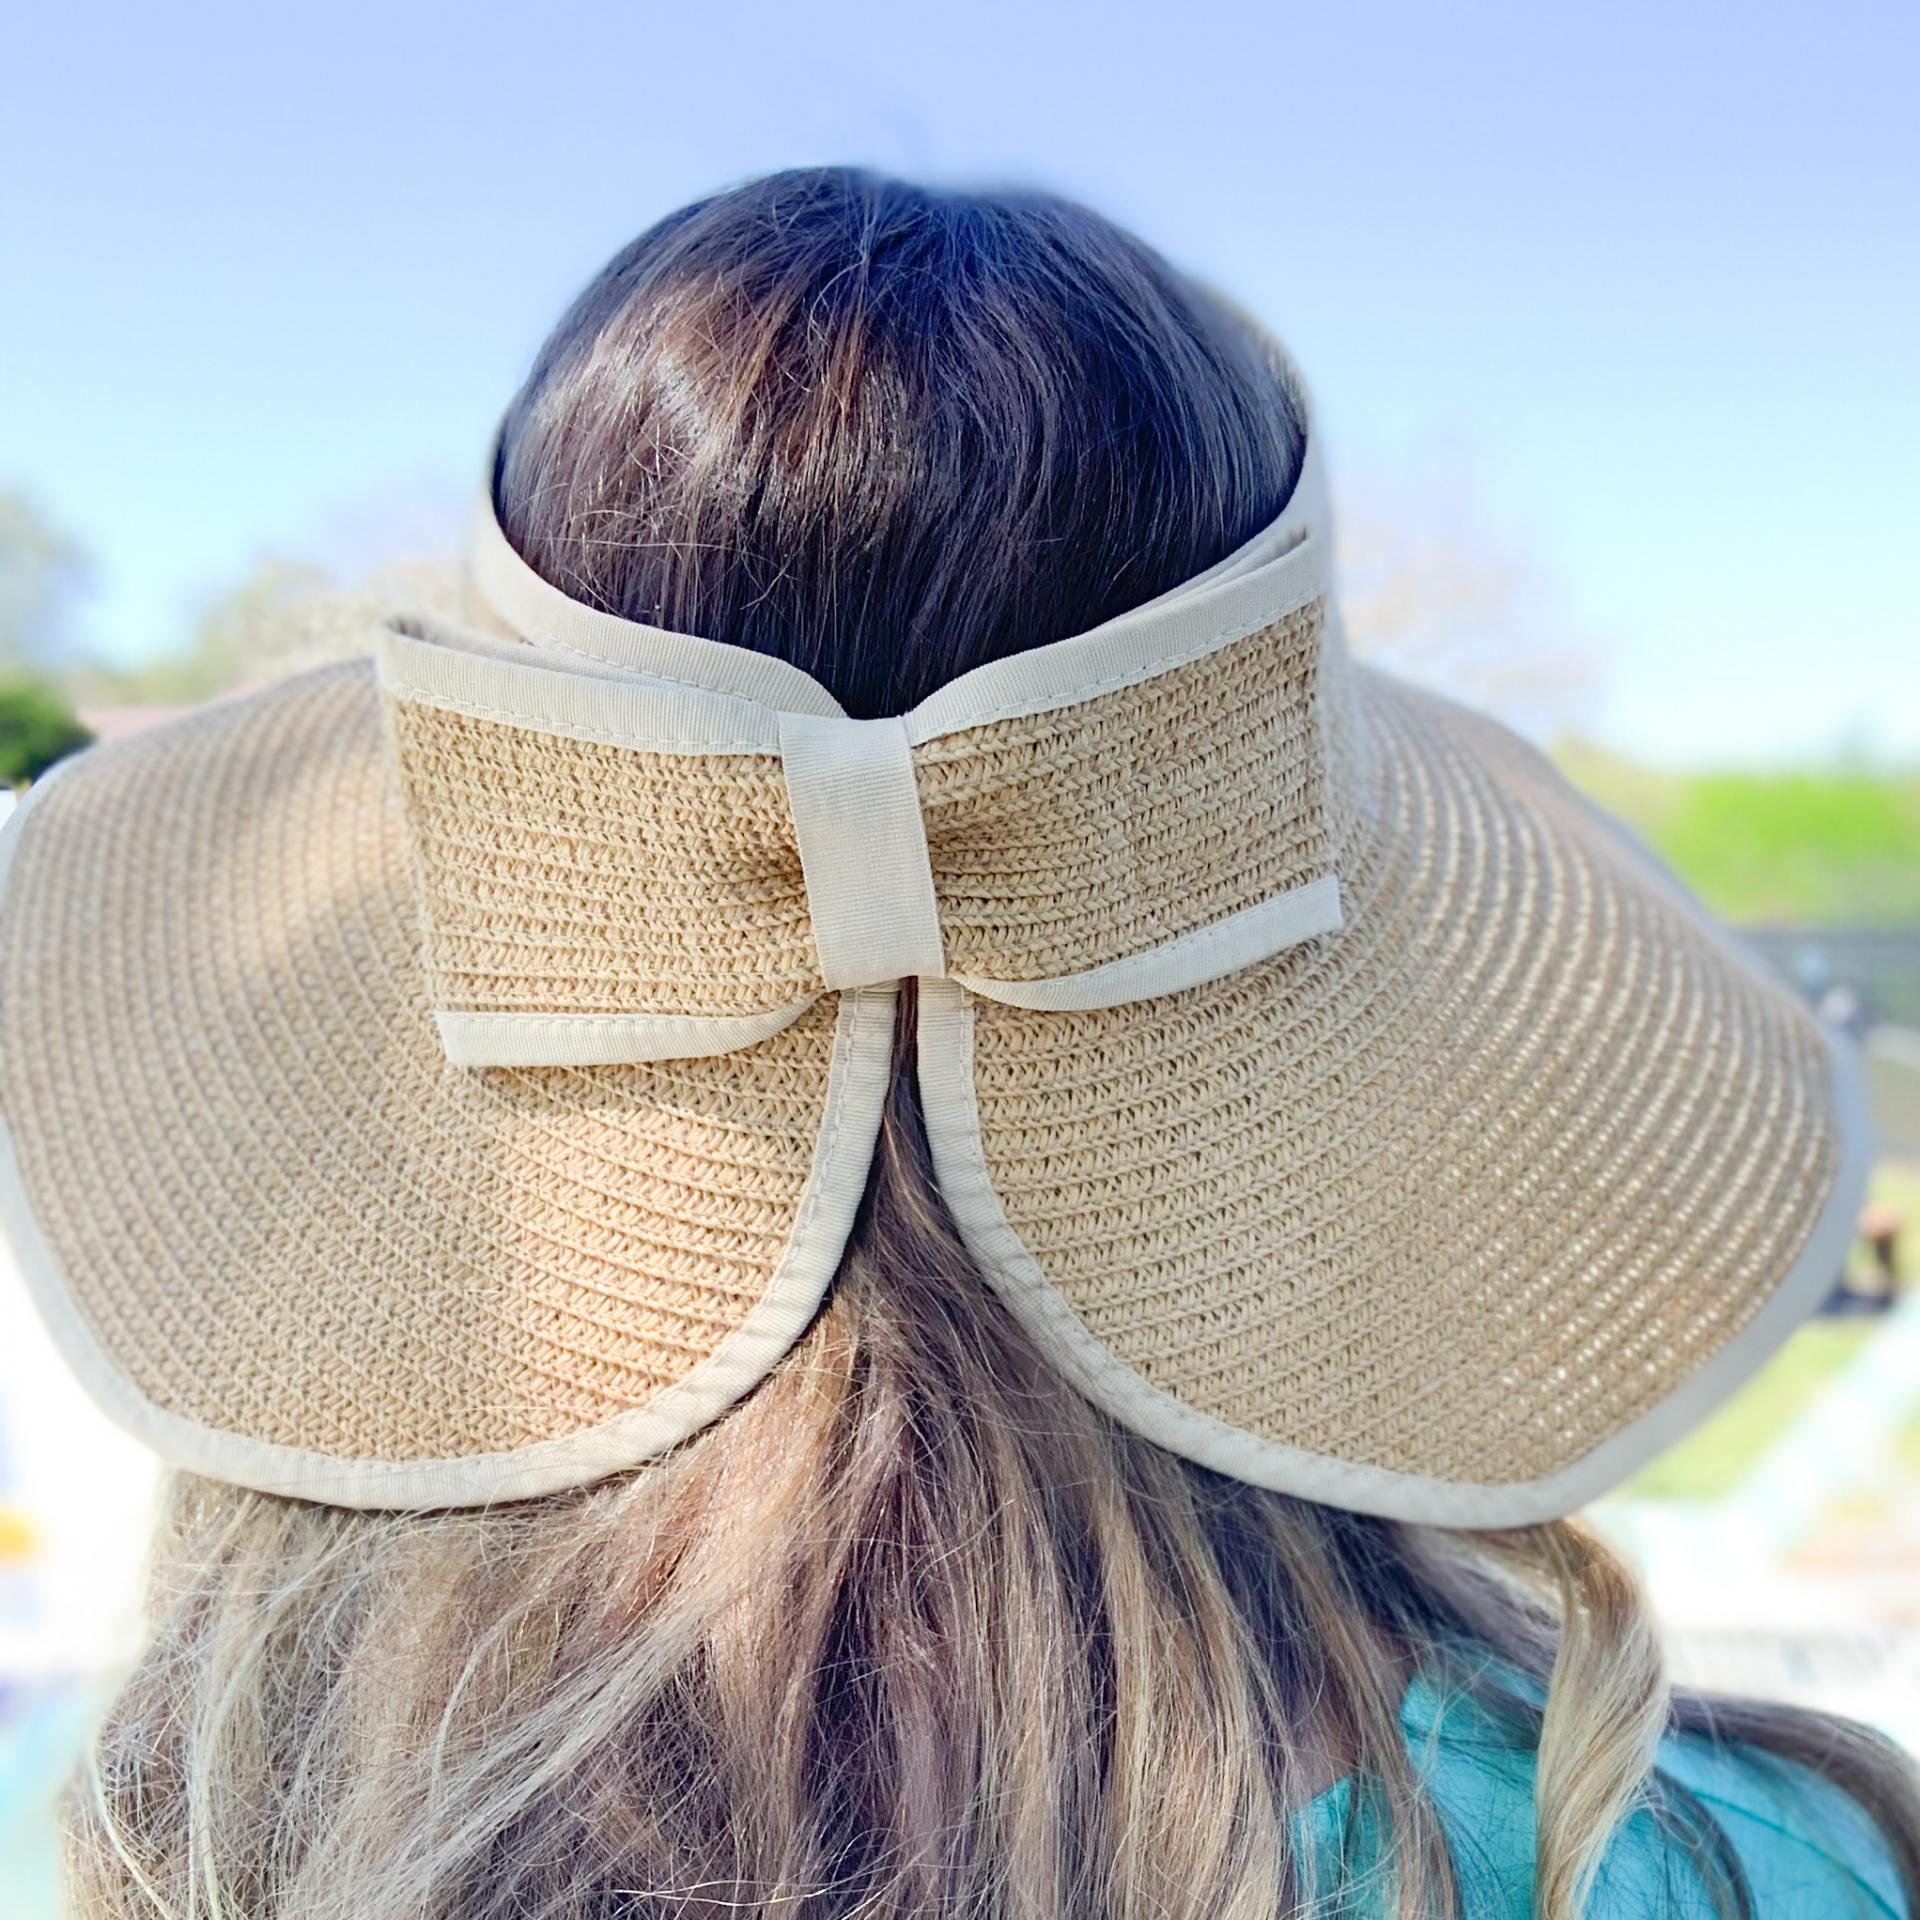 Beach vacation capsule wardrobe- packable sun hat visor